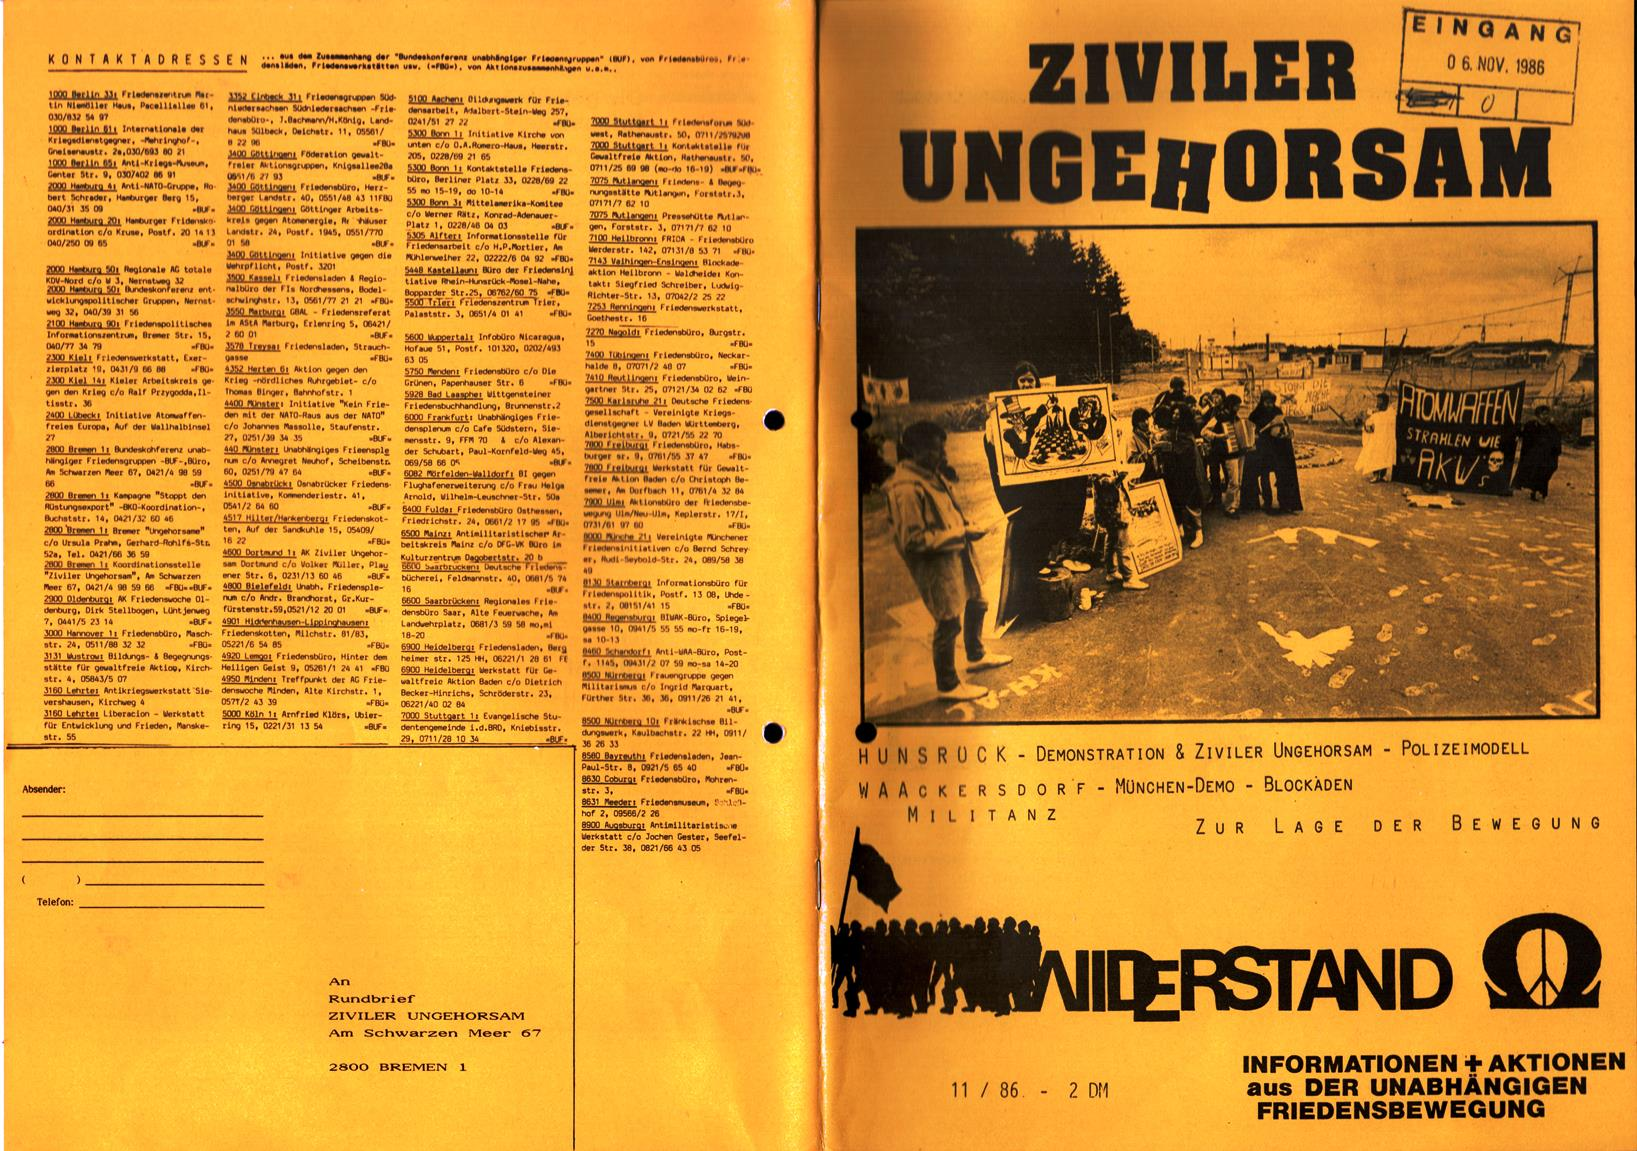 Ziviler_Ungehorsam_1986_011_001